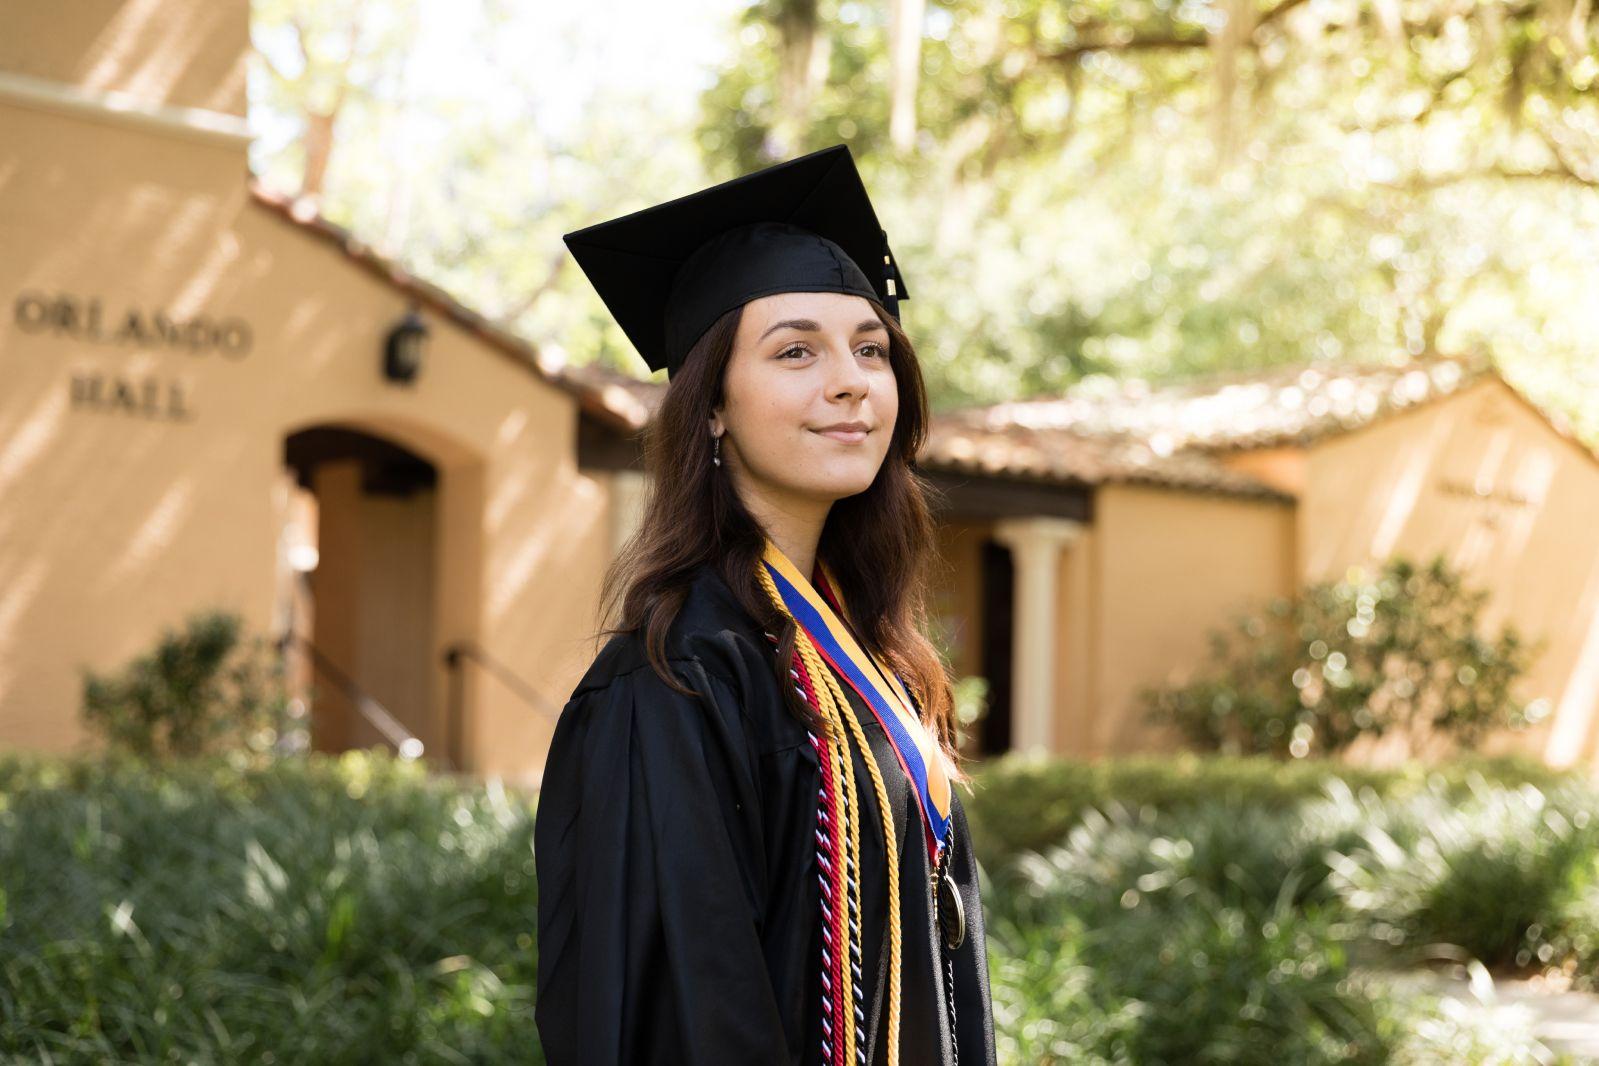 Karina Barbesino '19 dressed in graduation regalia on campus.